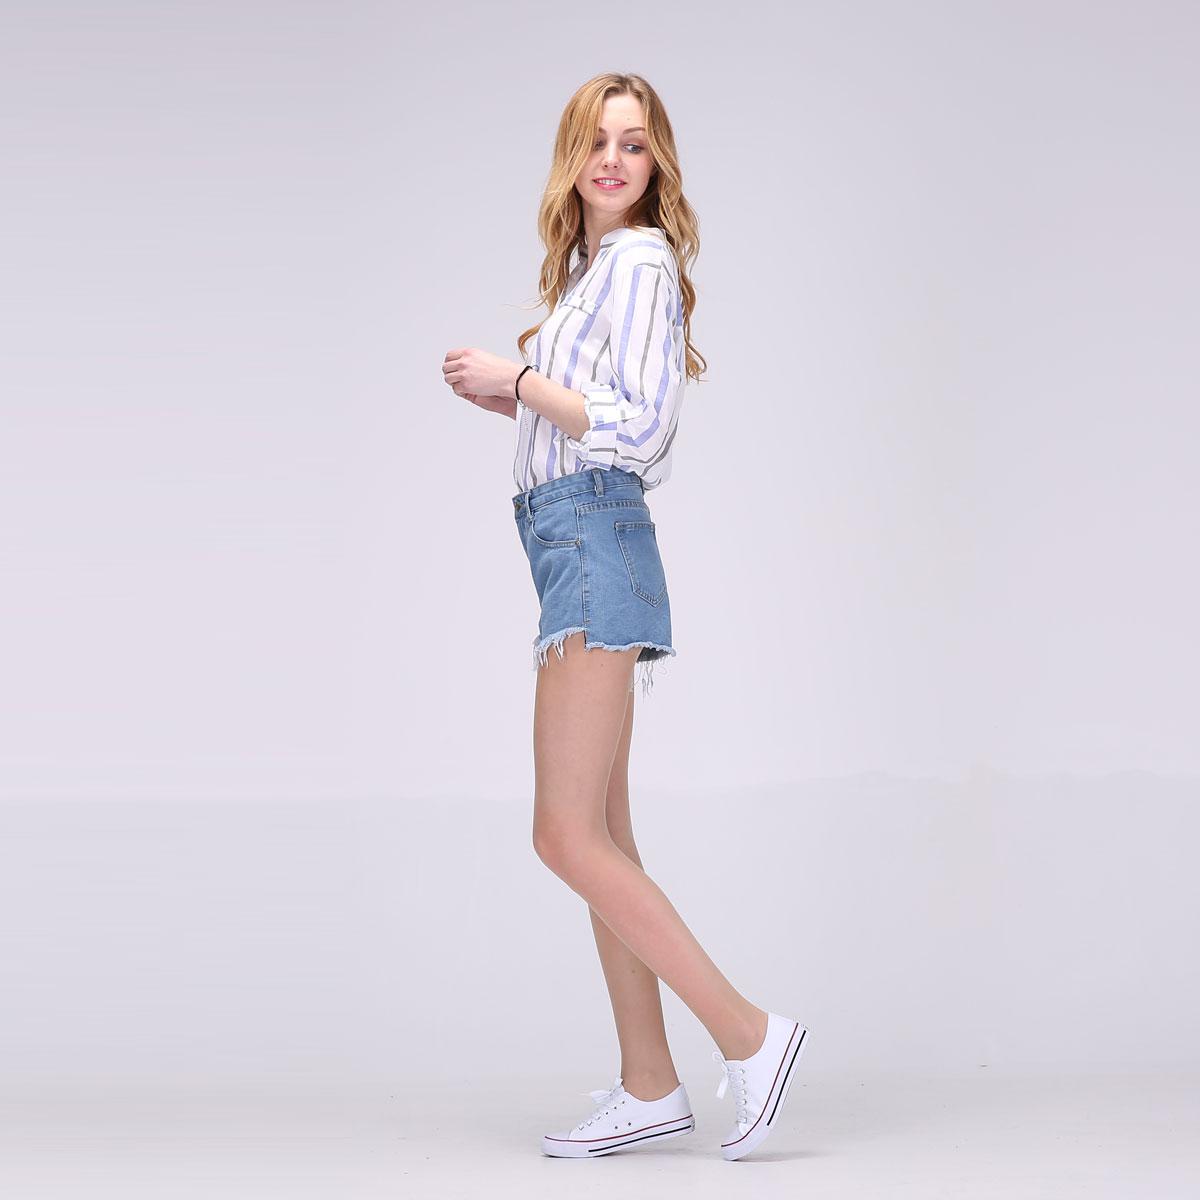 2017 Hot New Women Full Sleeve Blouses Striped Shirts Women Summer Tops Flare Sleeve Blouse Chemise Femme P Size 14